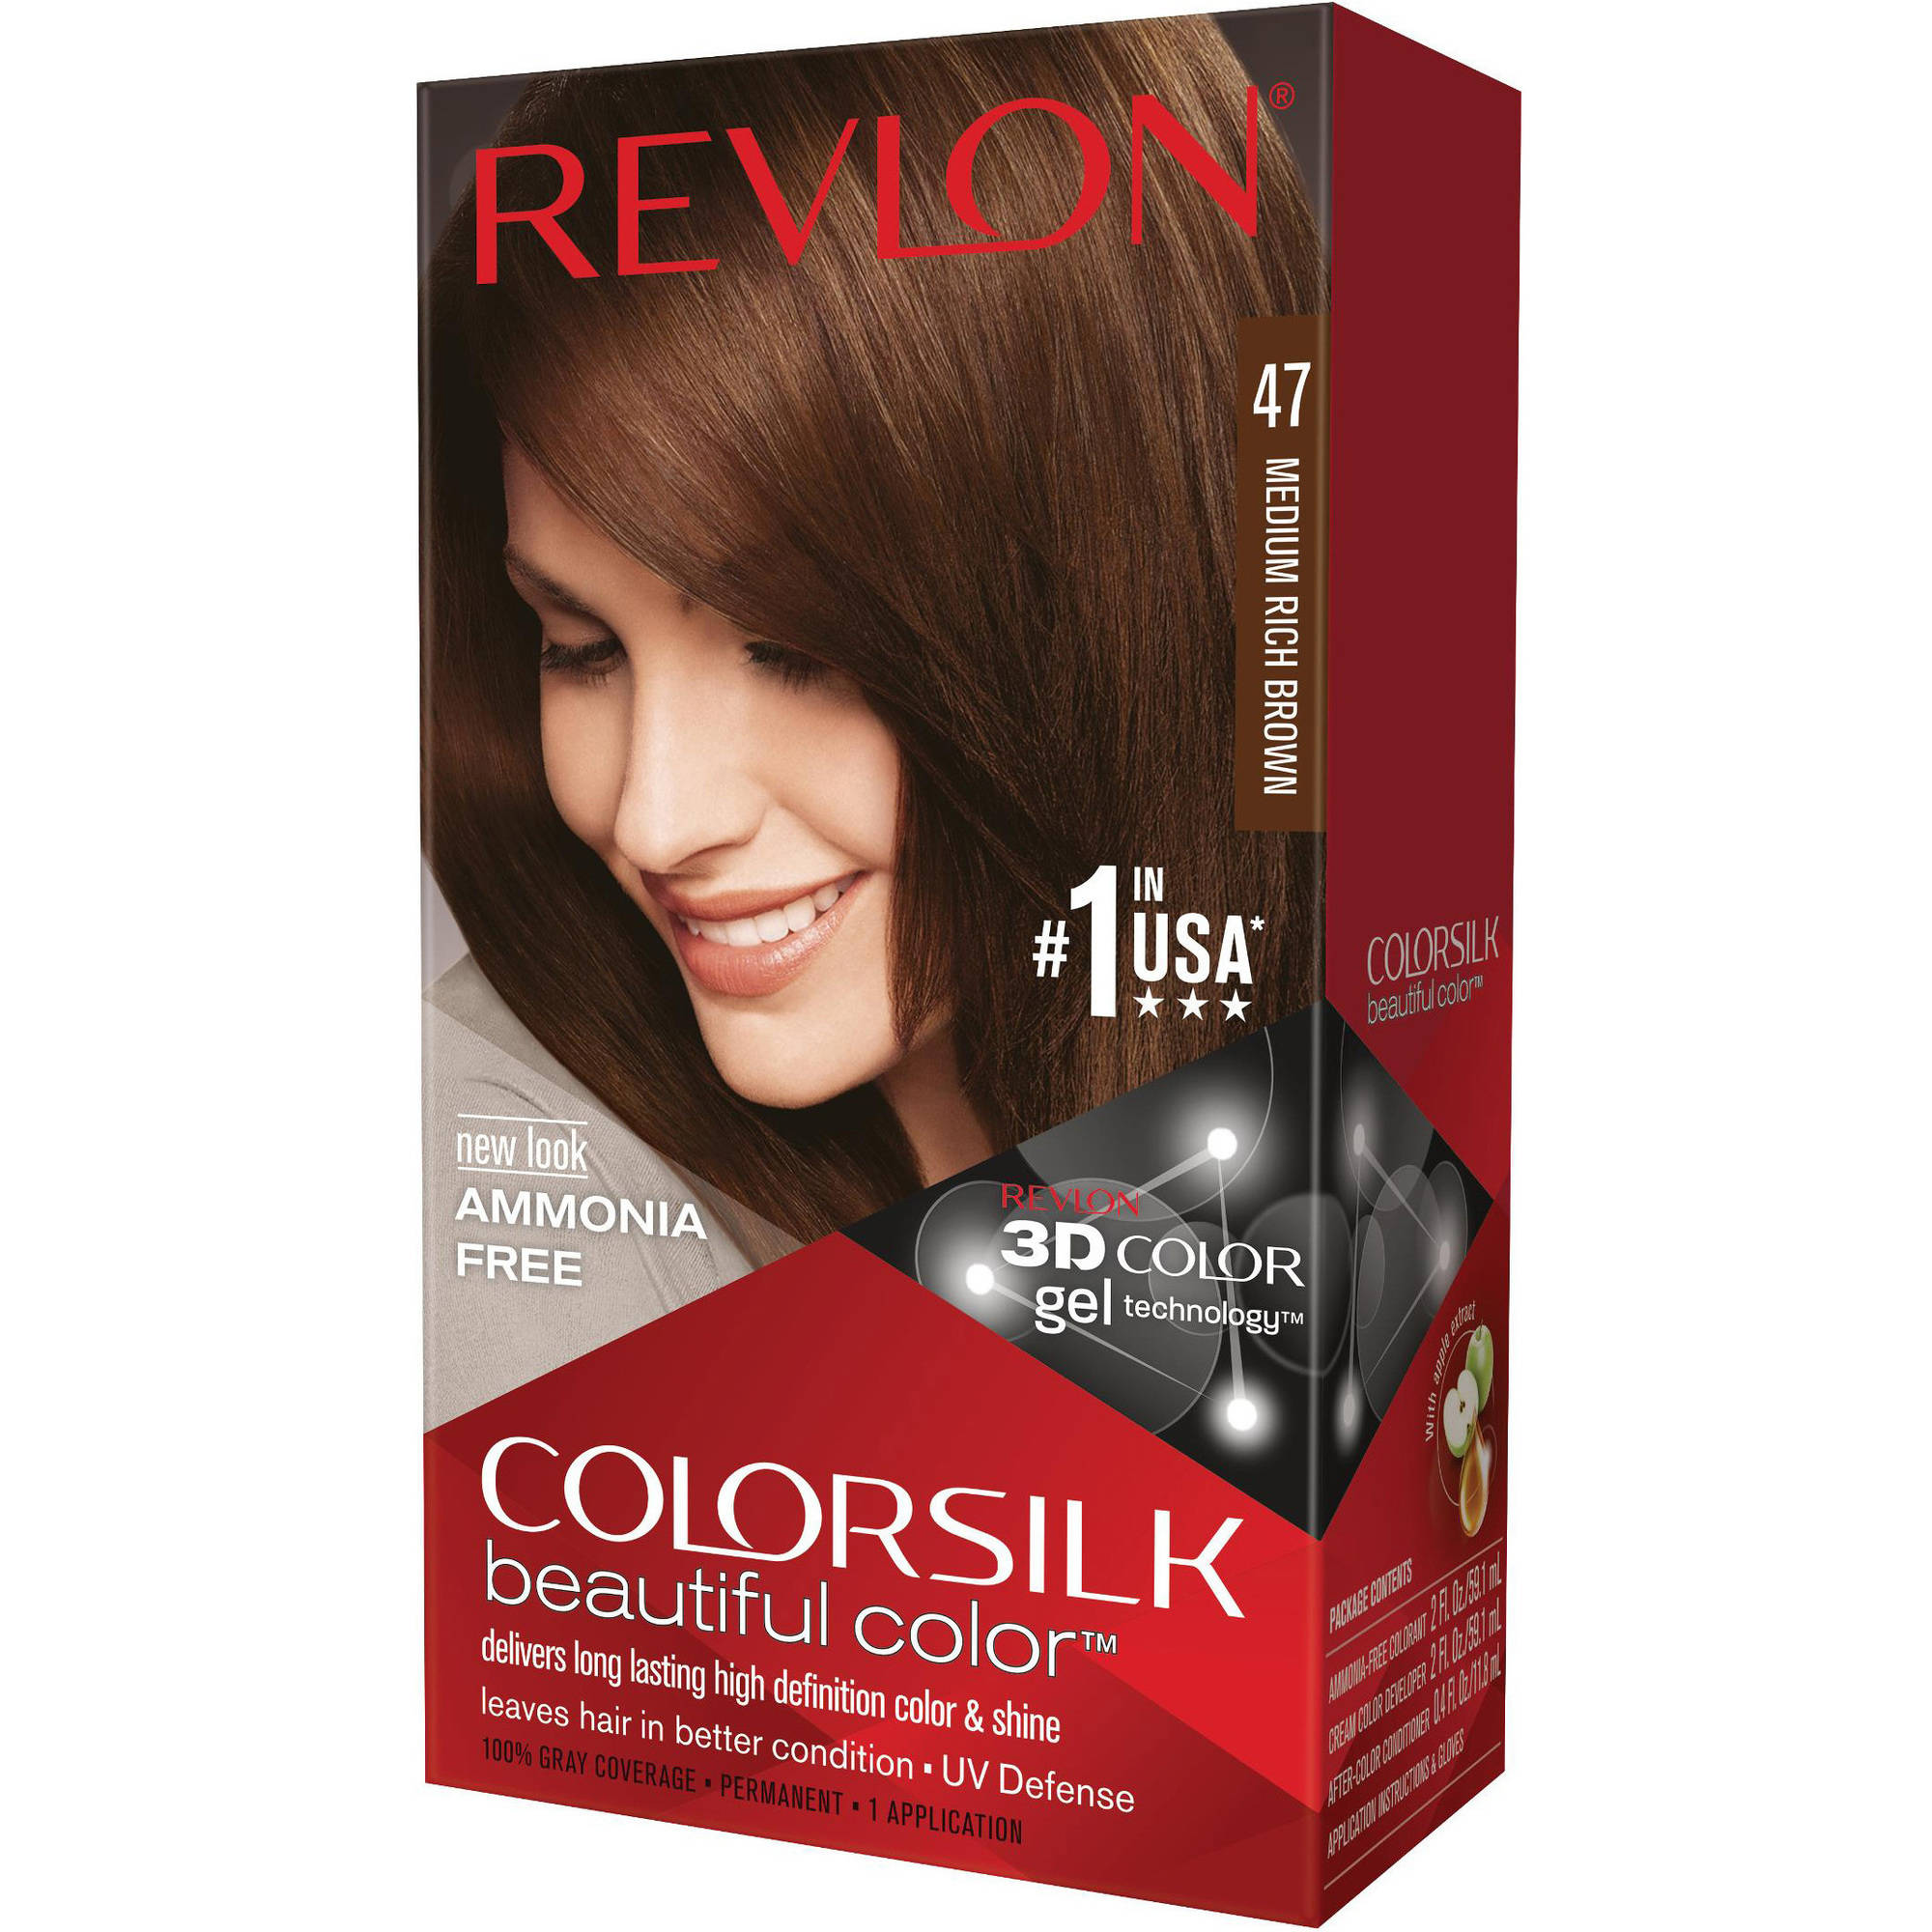 Gallery For Gt Revlon Colorsilk Medium Rich Brown